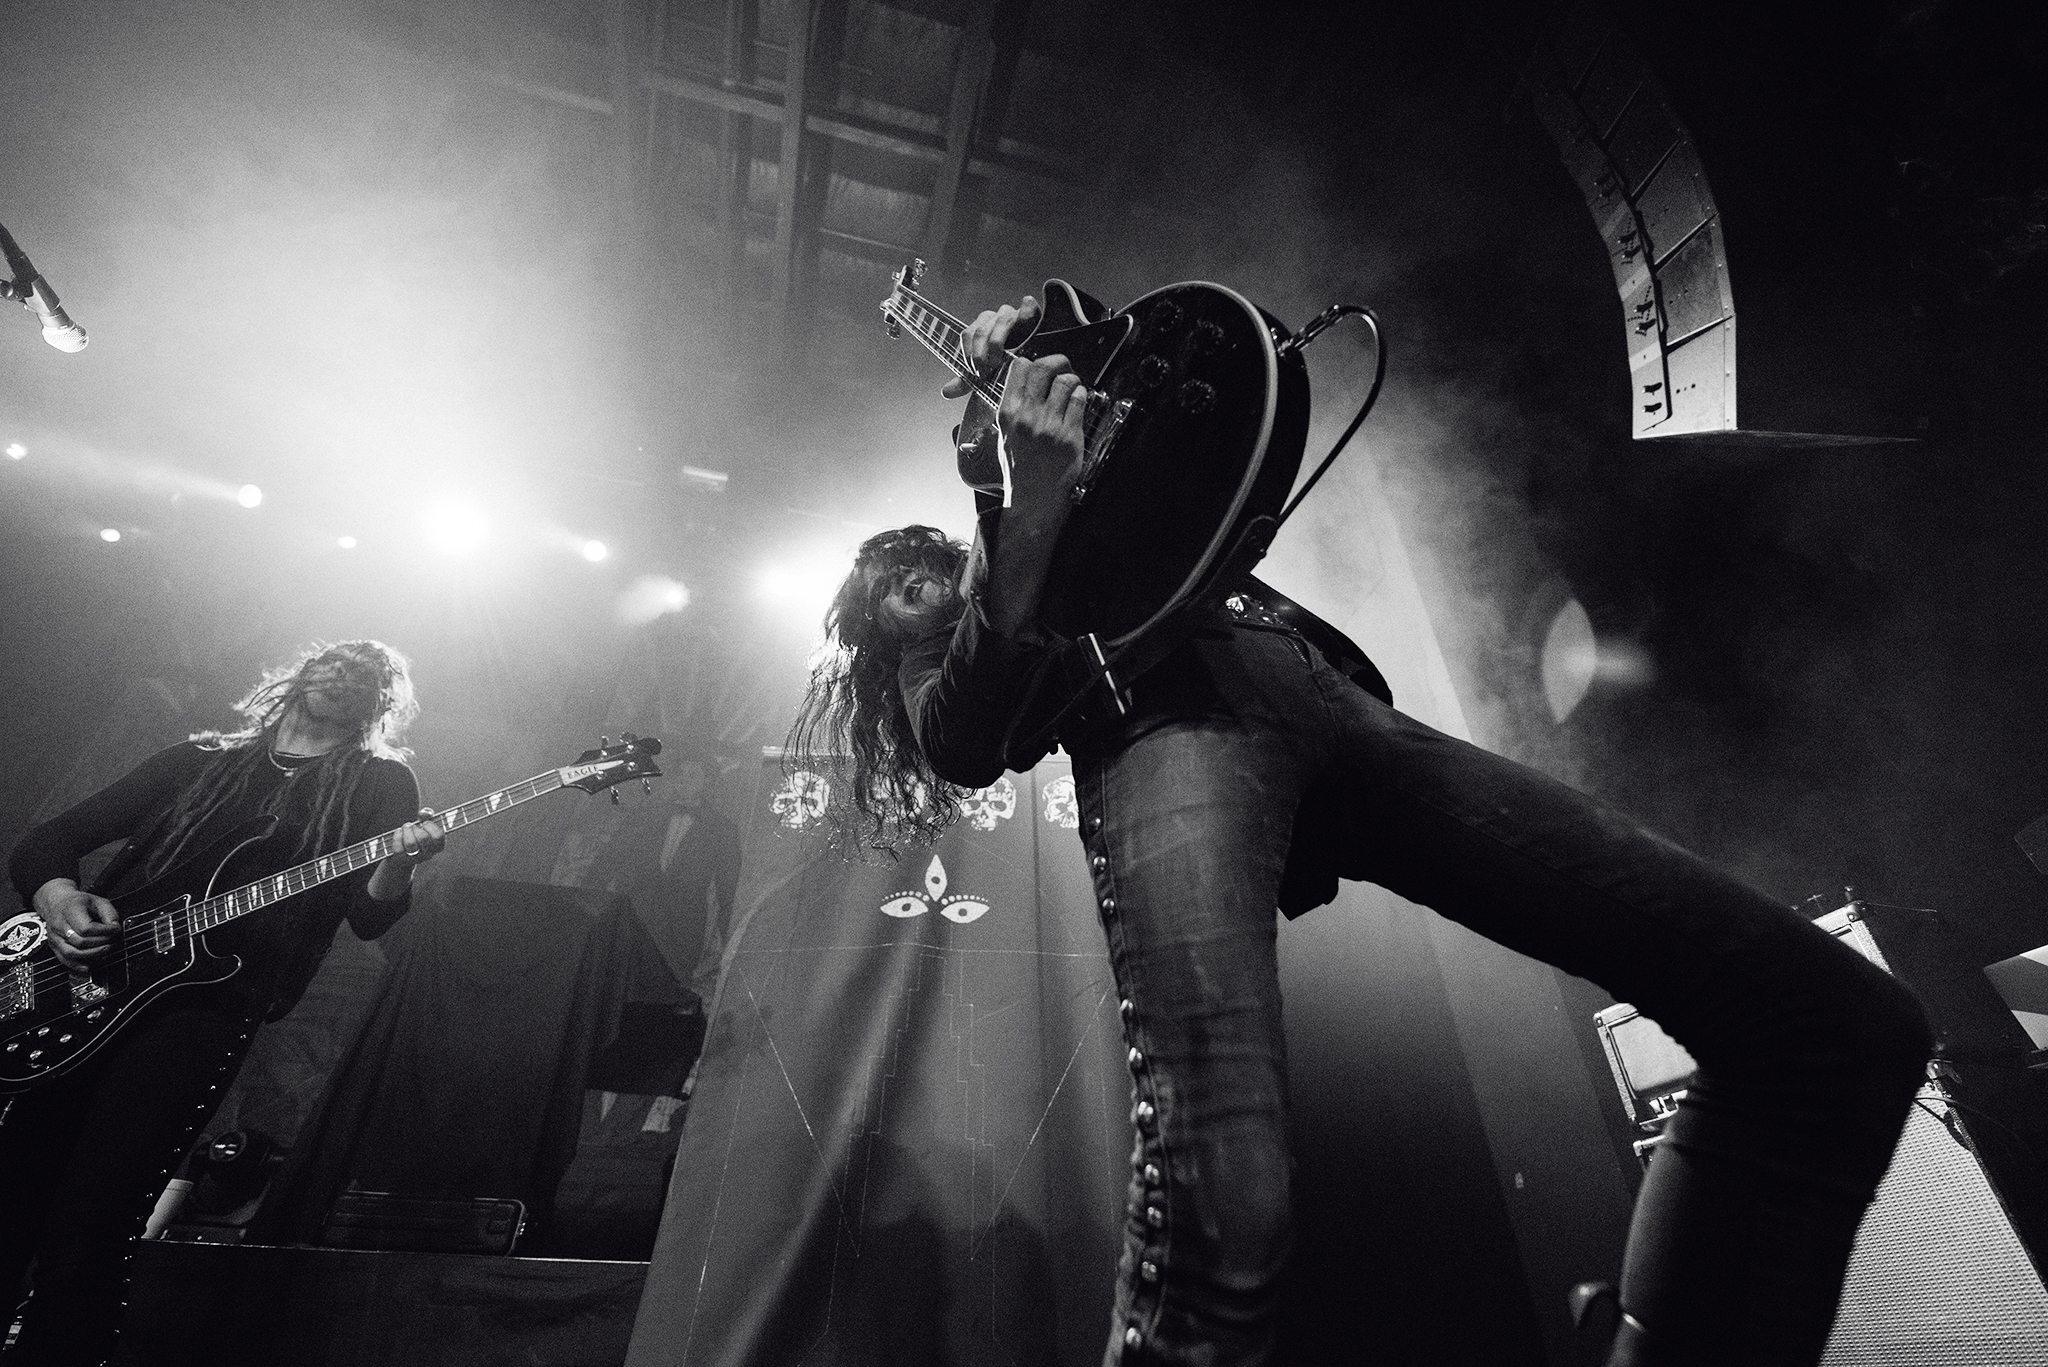 Tribulation-Emos-Concert-Photography-Katrina-Barber-4.jpg